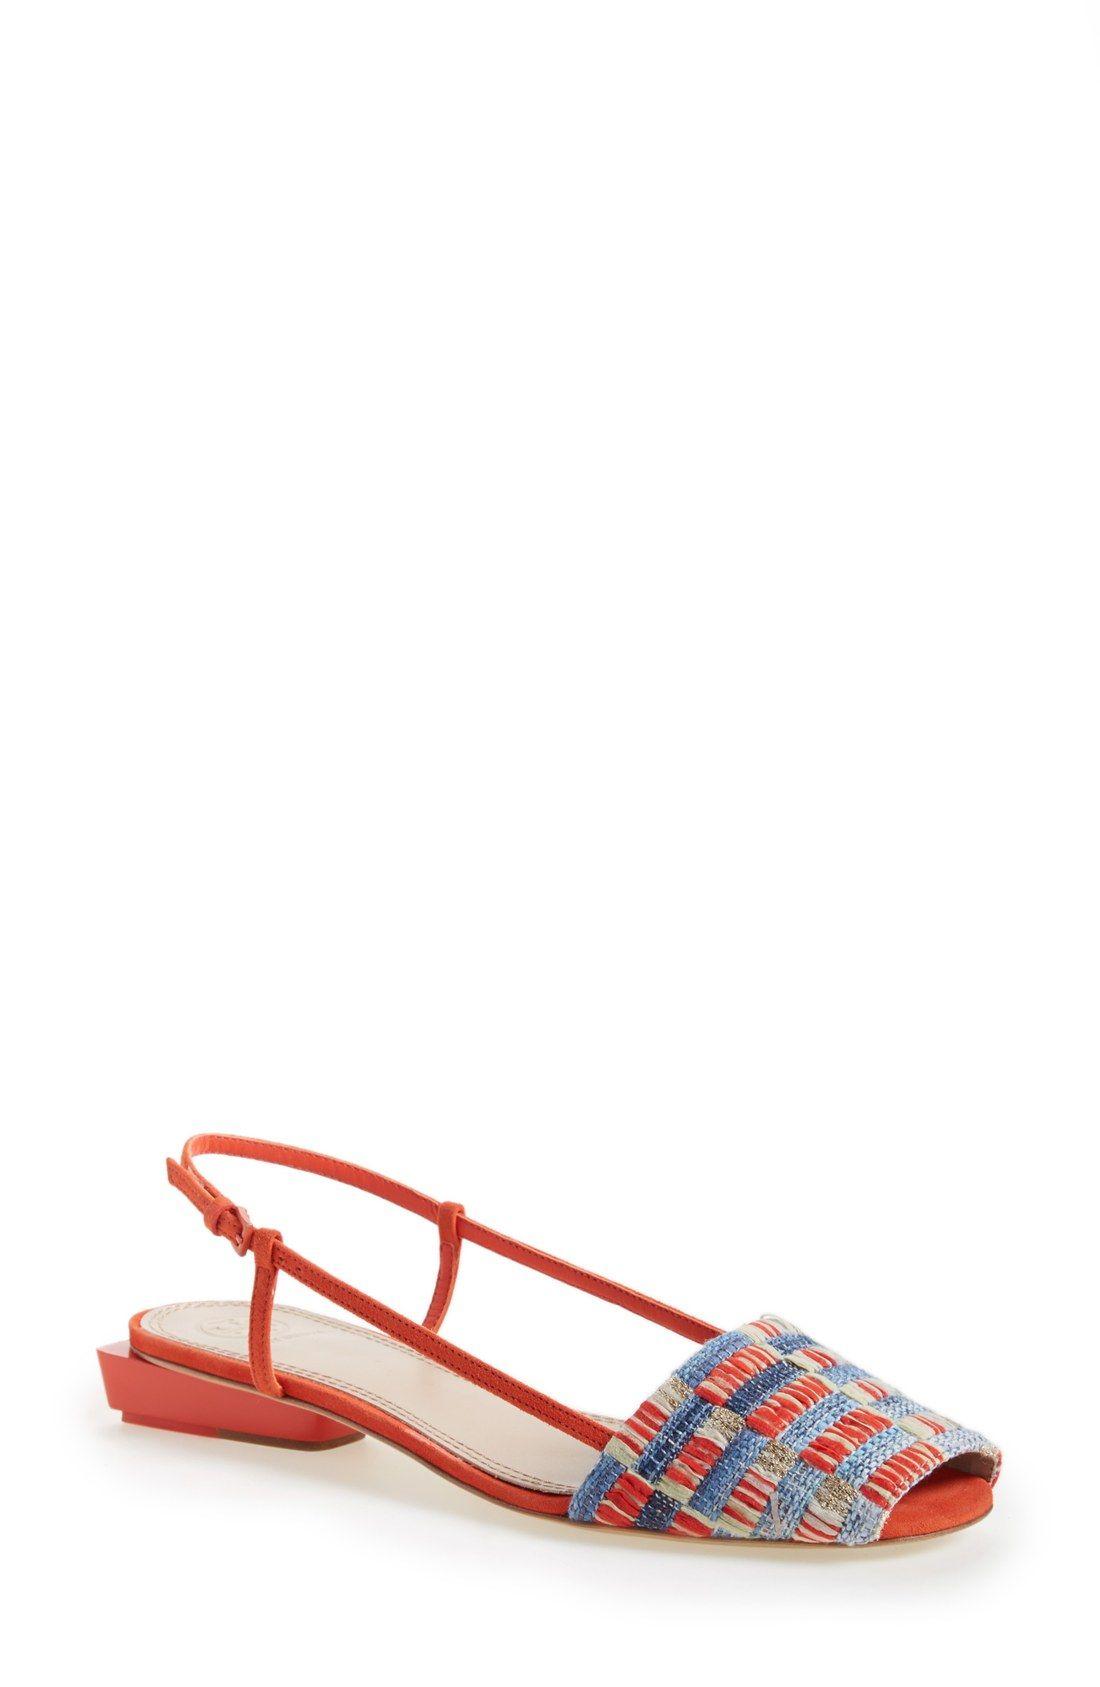 Tory Burch Pietra Peep Toe Sandal Women Shoes In 2019